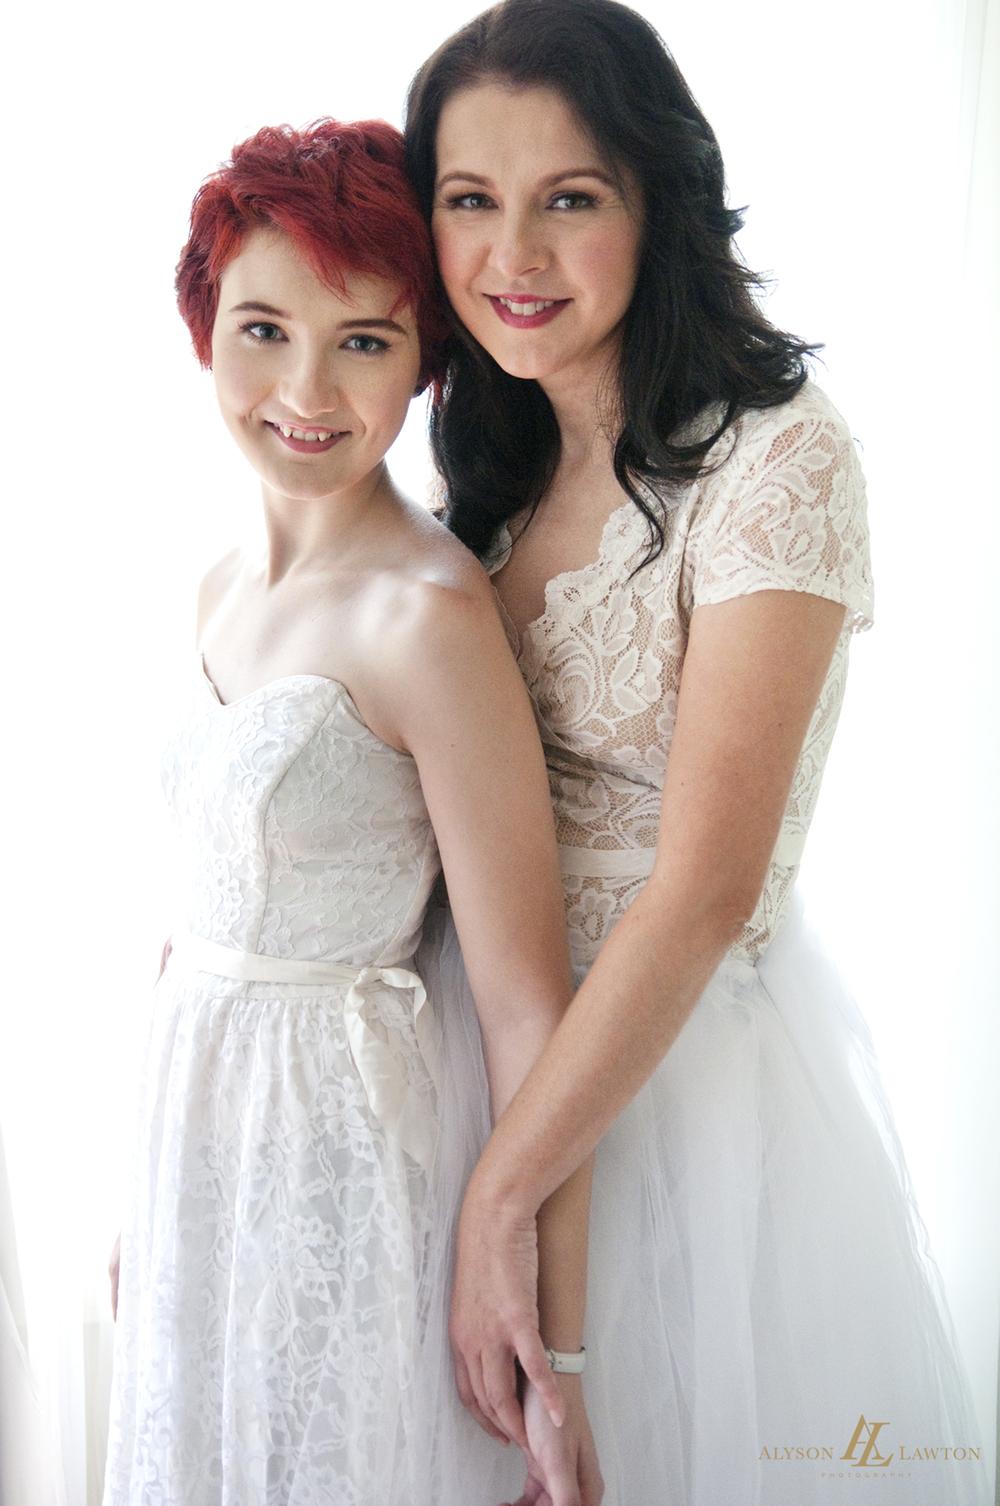 { North Carolina Wedding & Beauty Photographer |Sheila & Kearra| Winston-Salem, NC | Alyson Lawton Photography | www.alysonlawton.com }